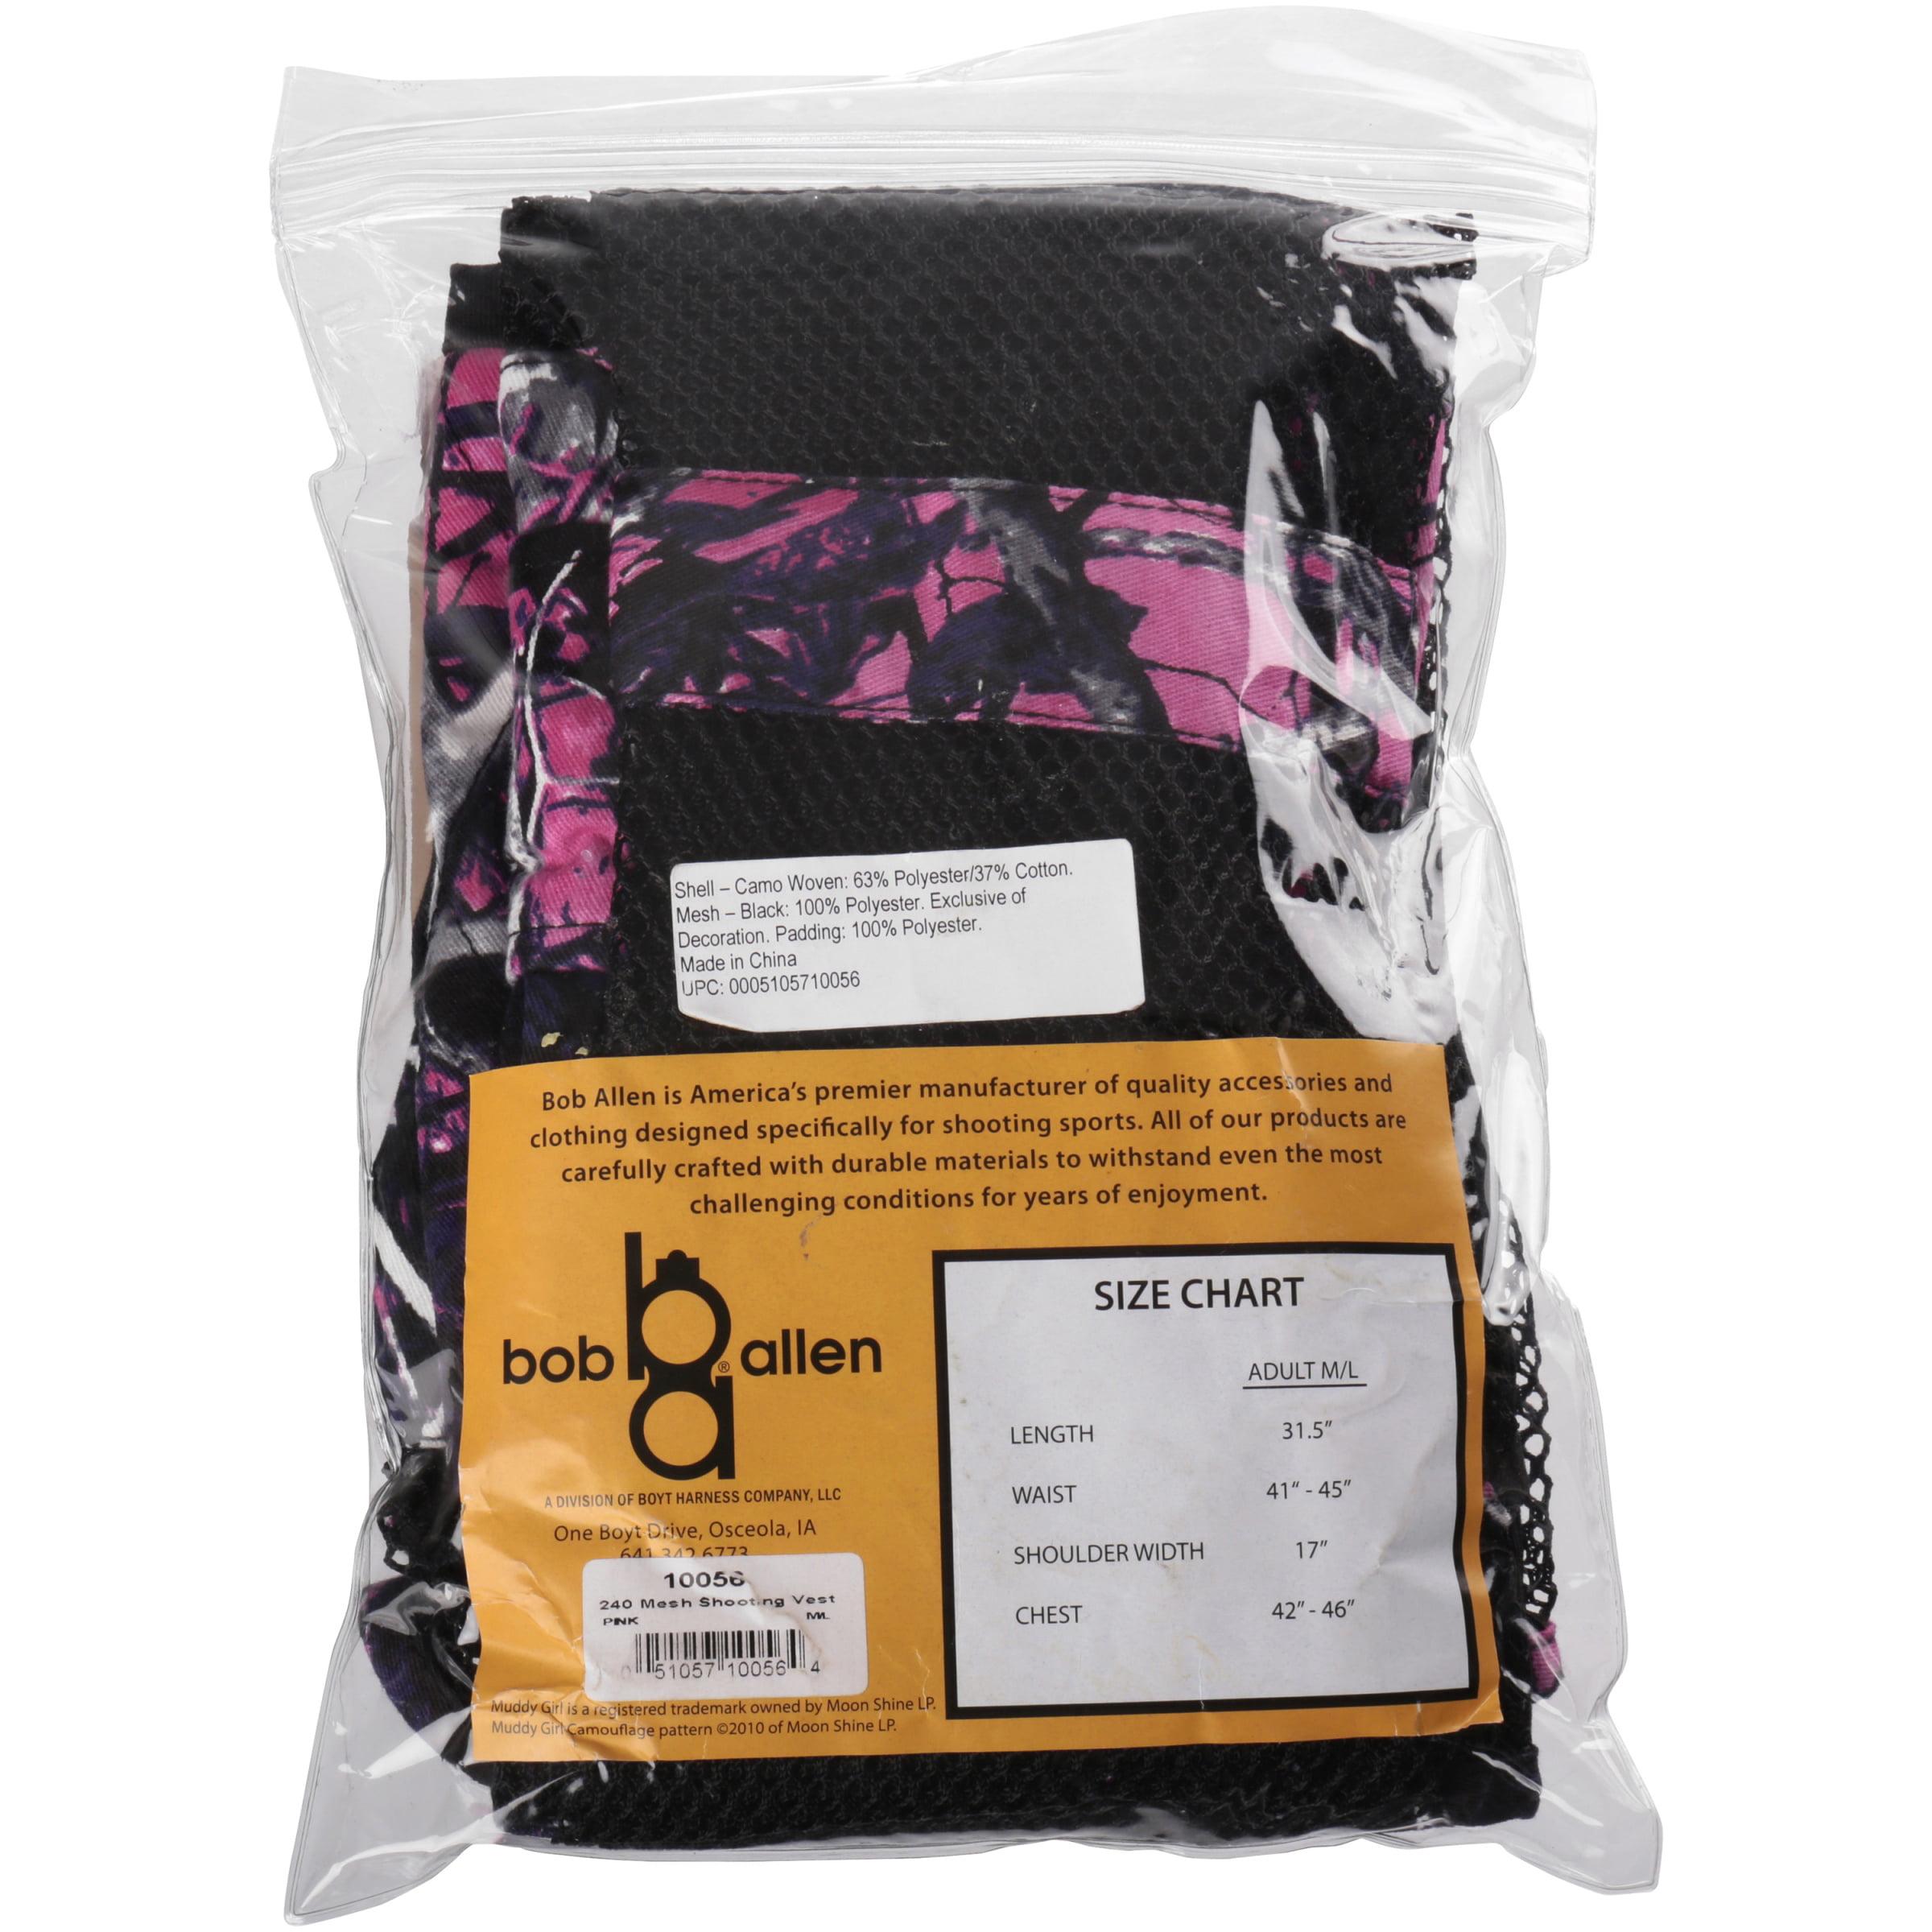 ddf07dad65527 The Outdoor Connection - Bob Allen® Muddy Girl Ladies M/L Full Mesh  Shooting Vest Pack - Walmart.com